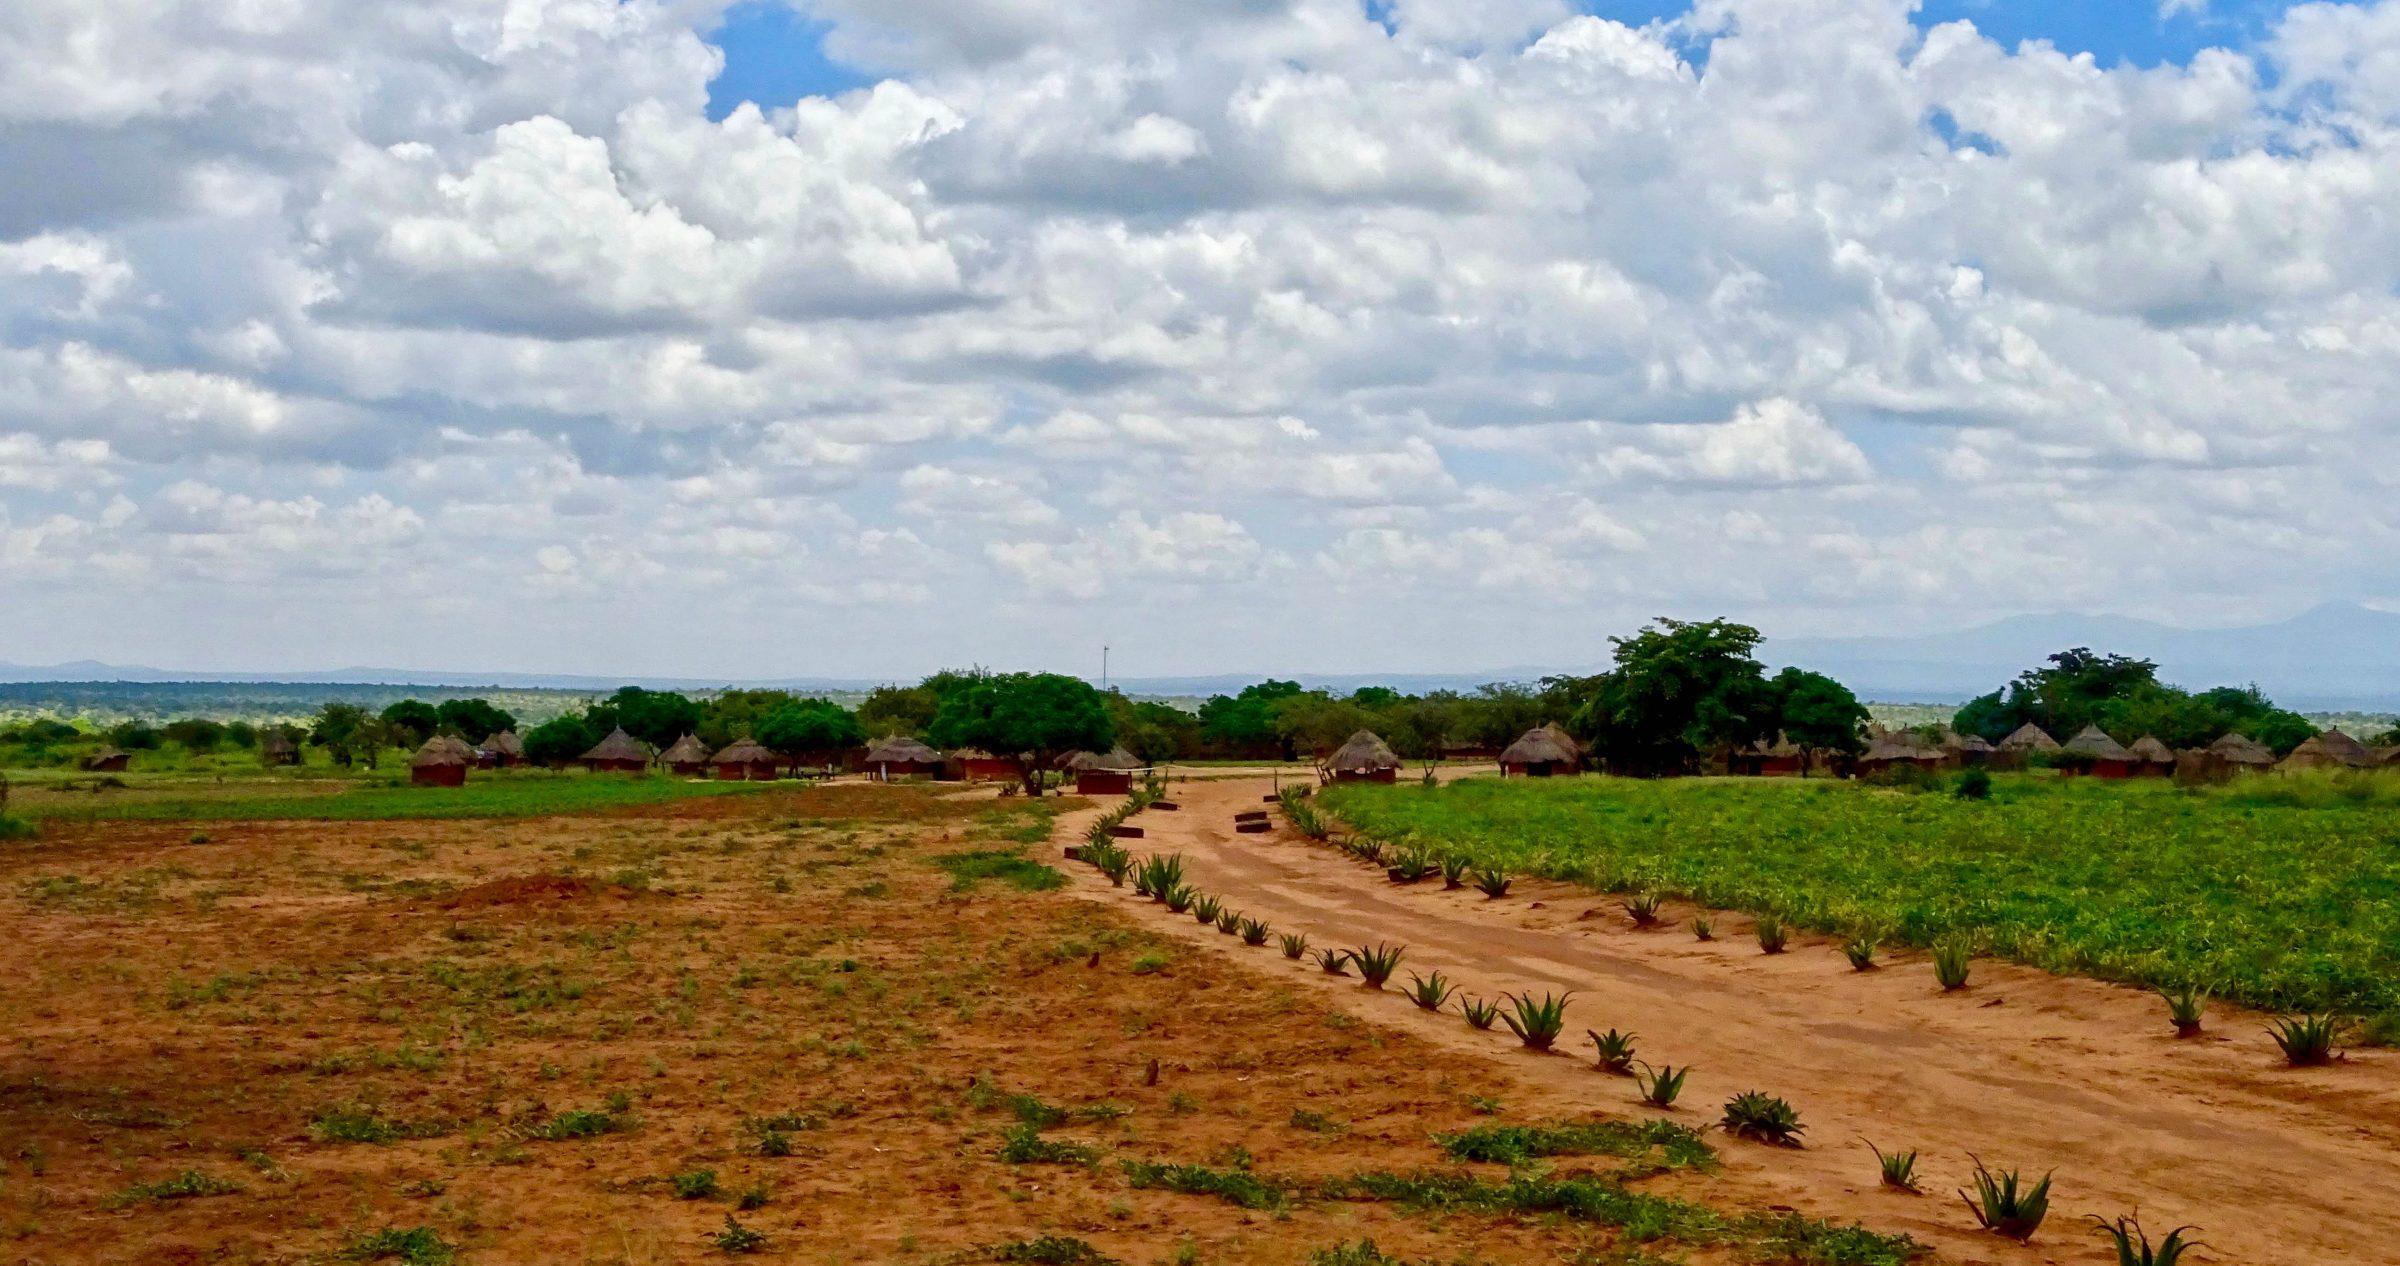 Een Karamojong nederzetting langs de puntgave asfaltweg van Moroto naar Nakapiripirit